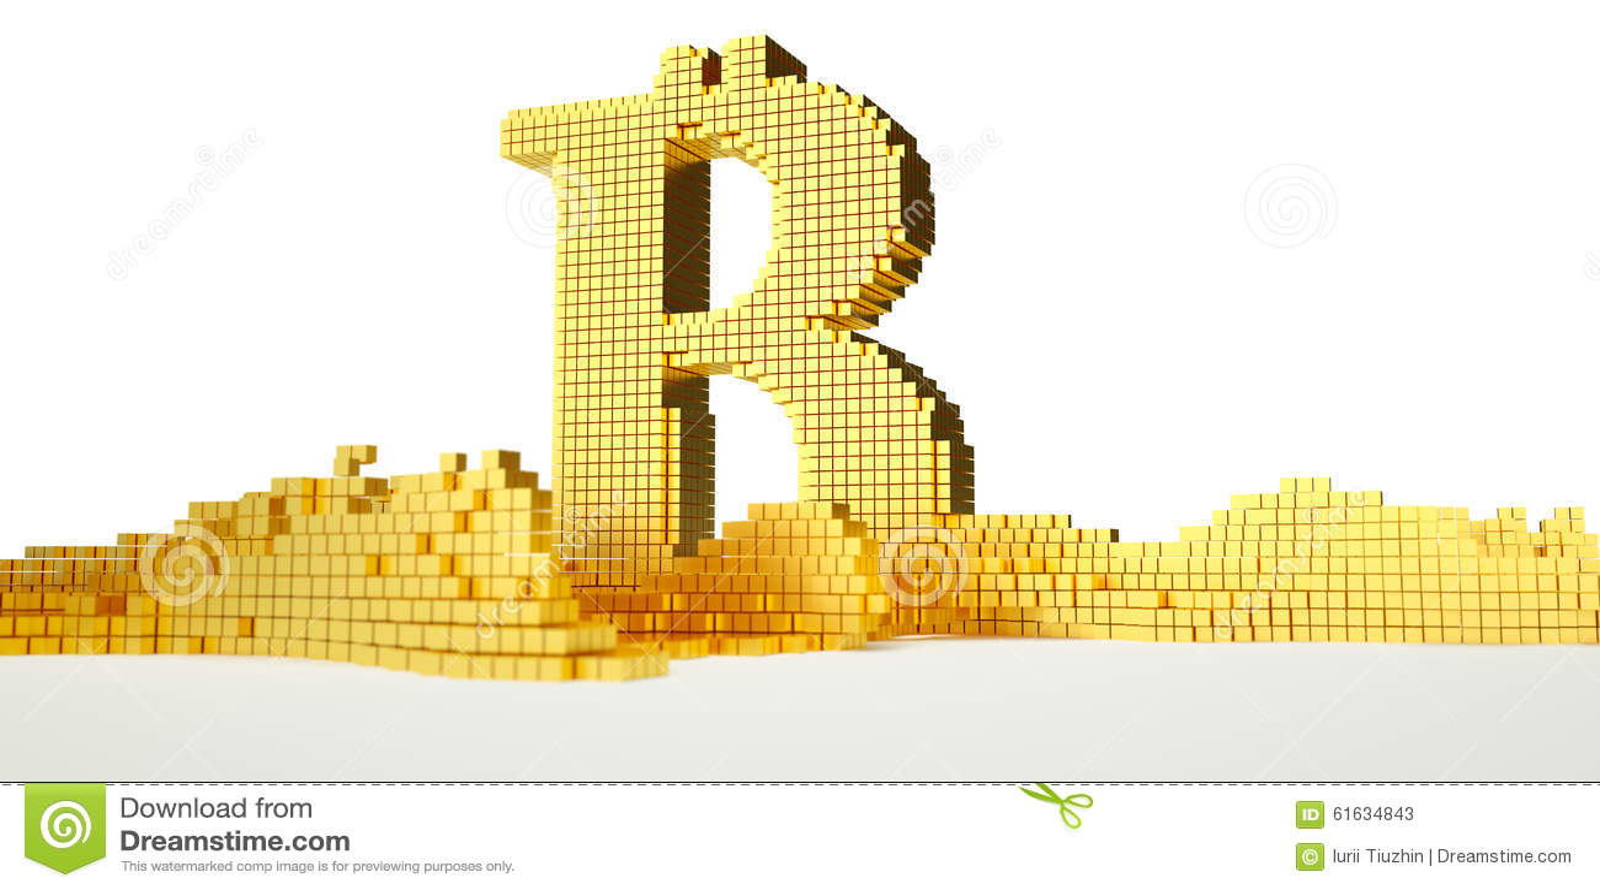 O símbolo de Bitcoin derrete no ouro líquido Trajeto